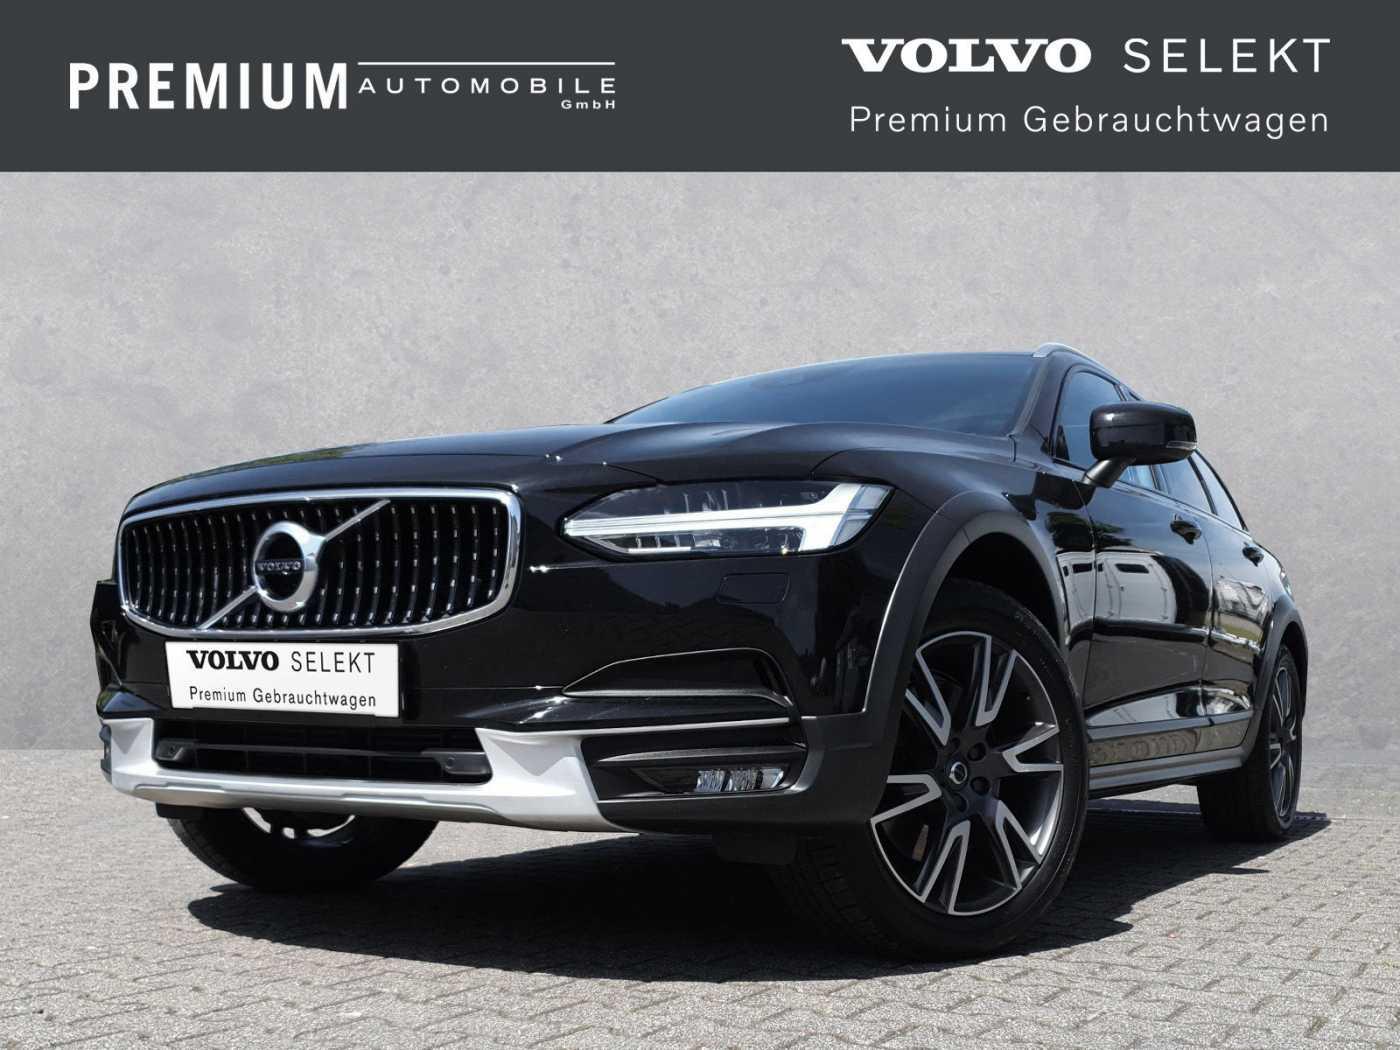 Volvo V90 Cross Country D5 AWD Geartronic Pro AHK/LED/Keyless, Jahr 2018, Diesel